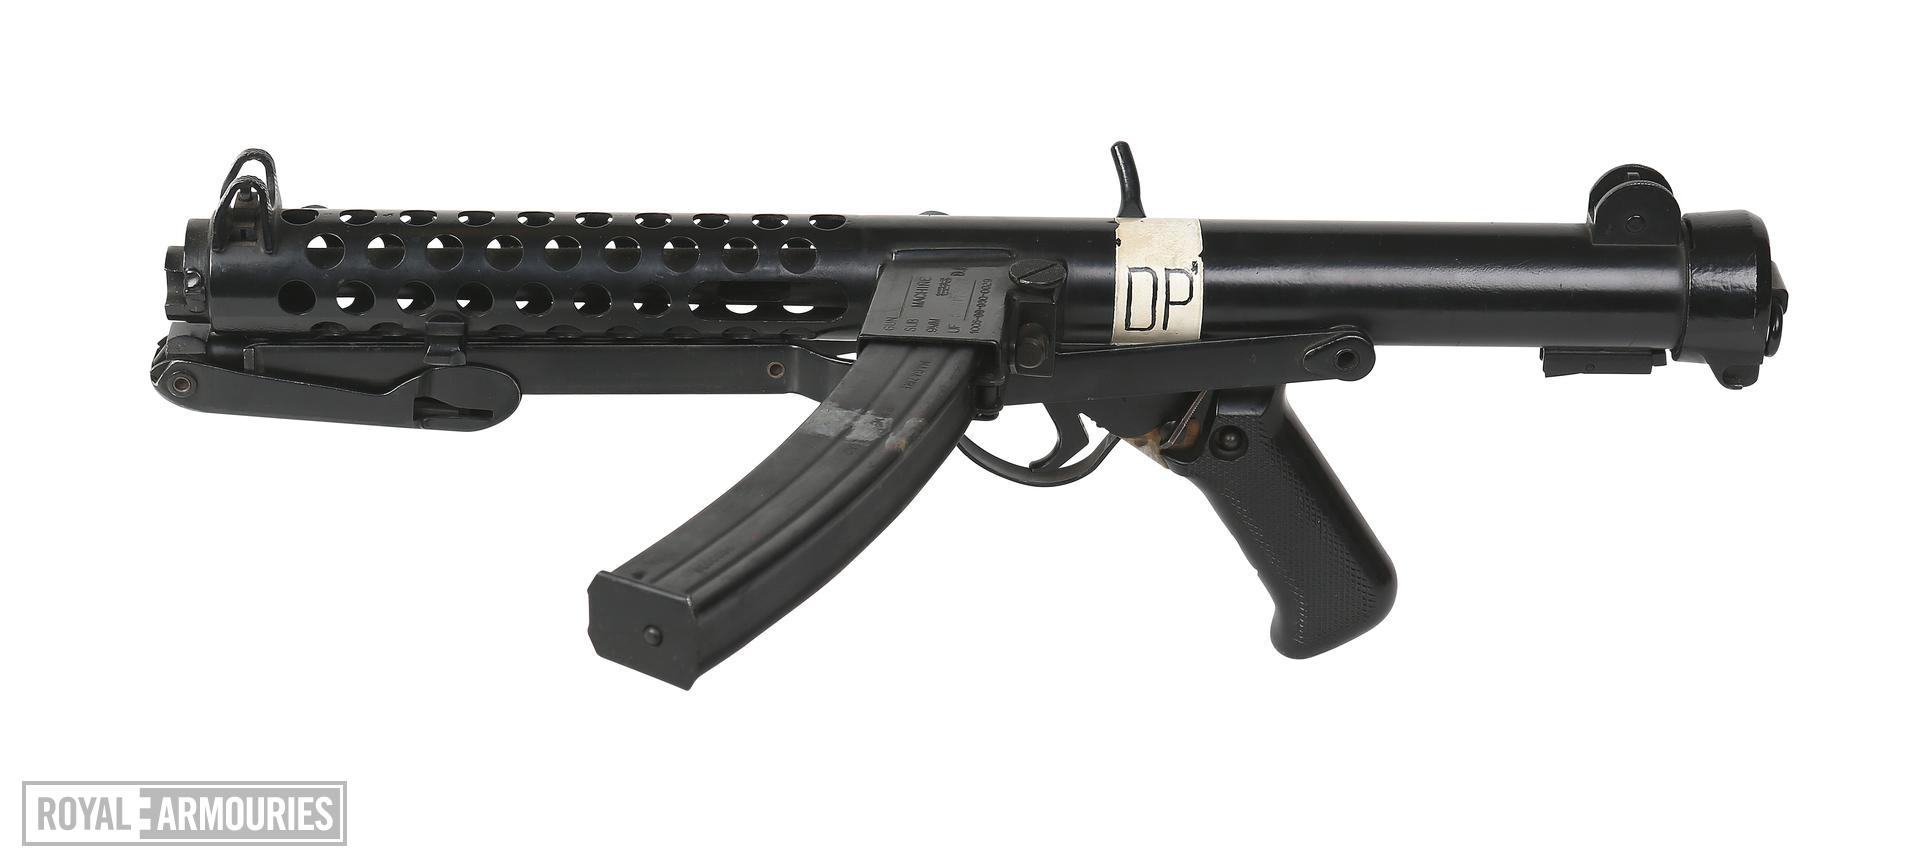 Sterling L49A1 DP, Drill Purpose conversion of the L2A3